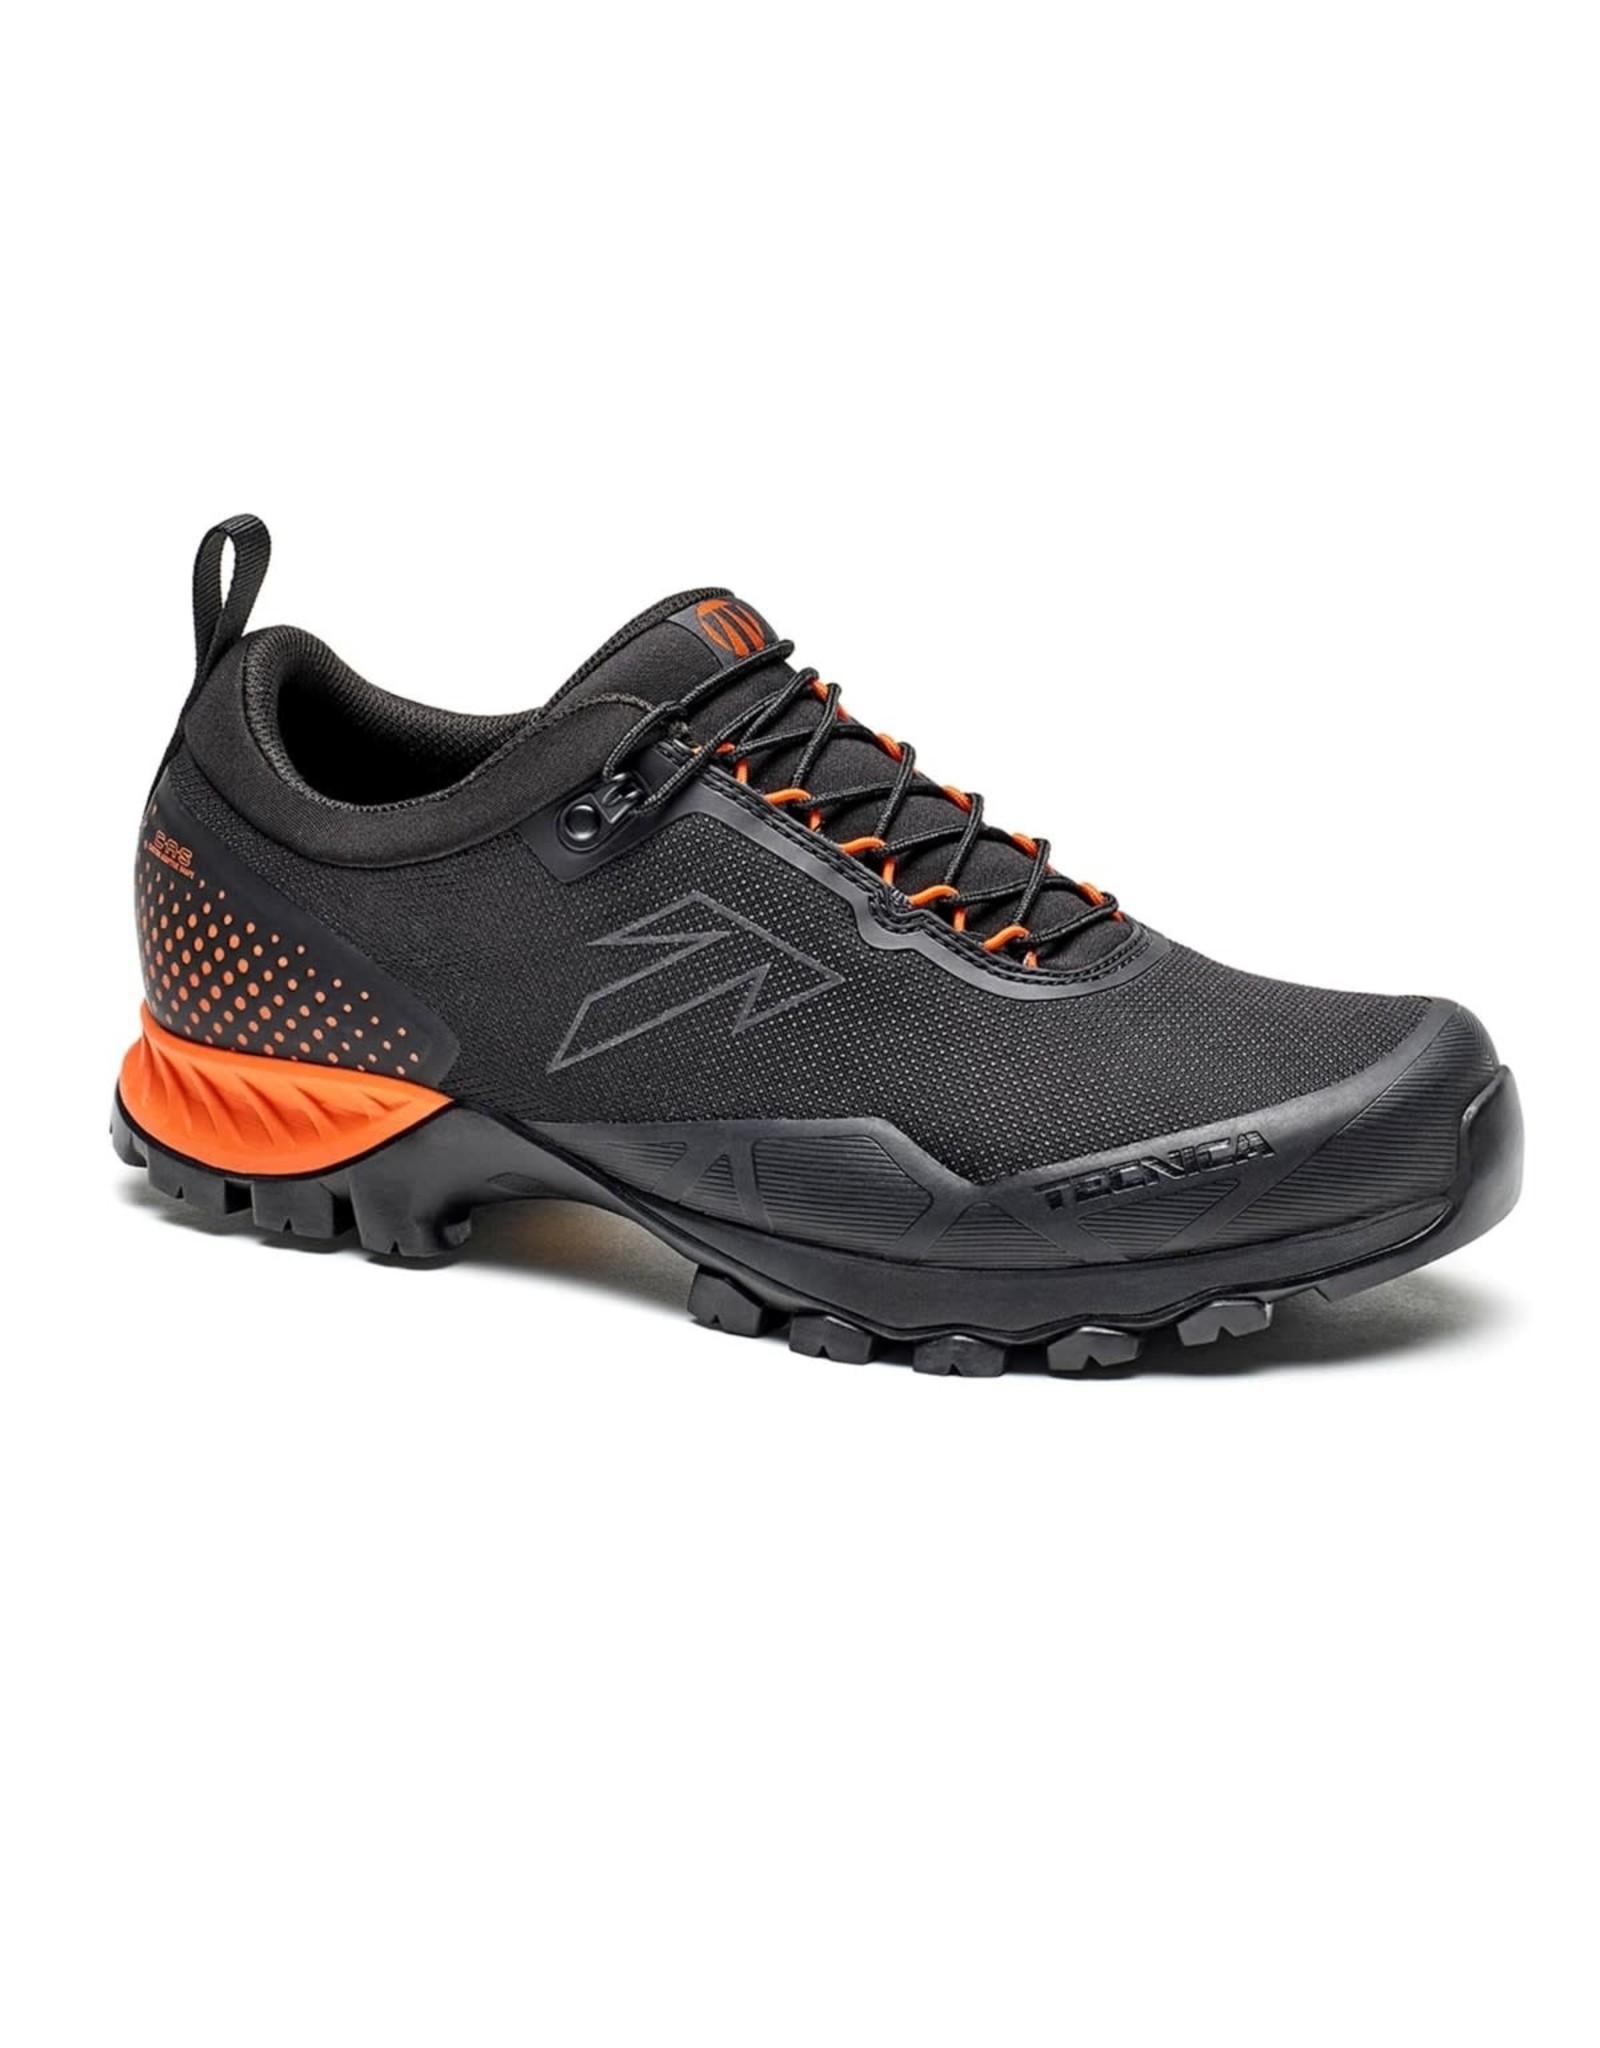 Tecnica Tecnica Plasma S Shoes - Men